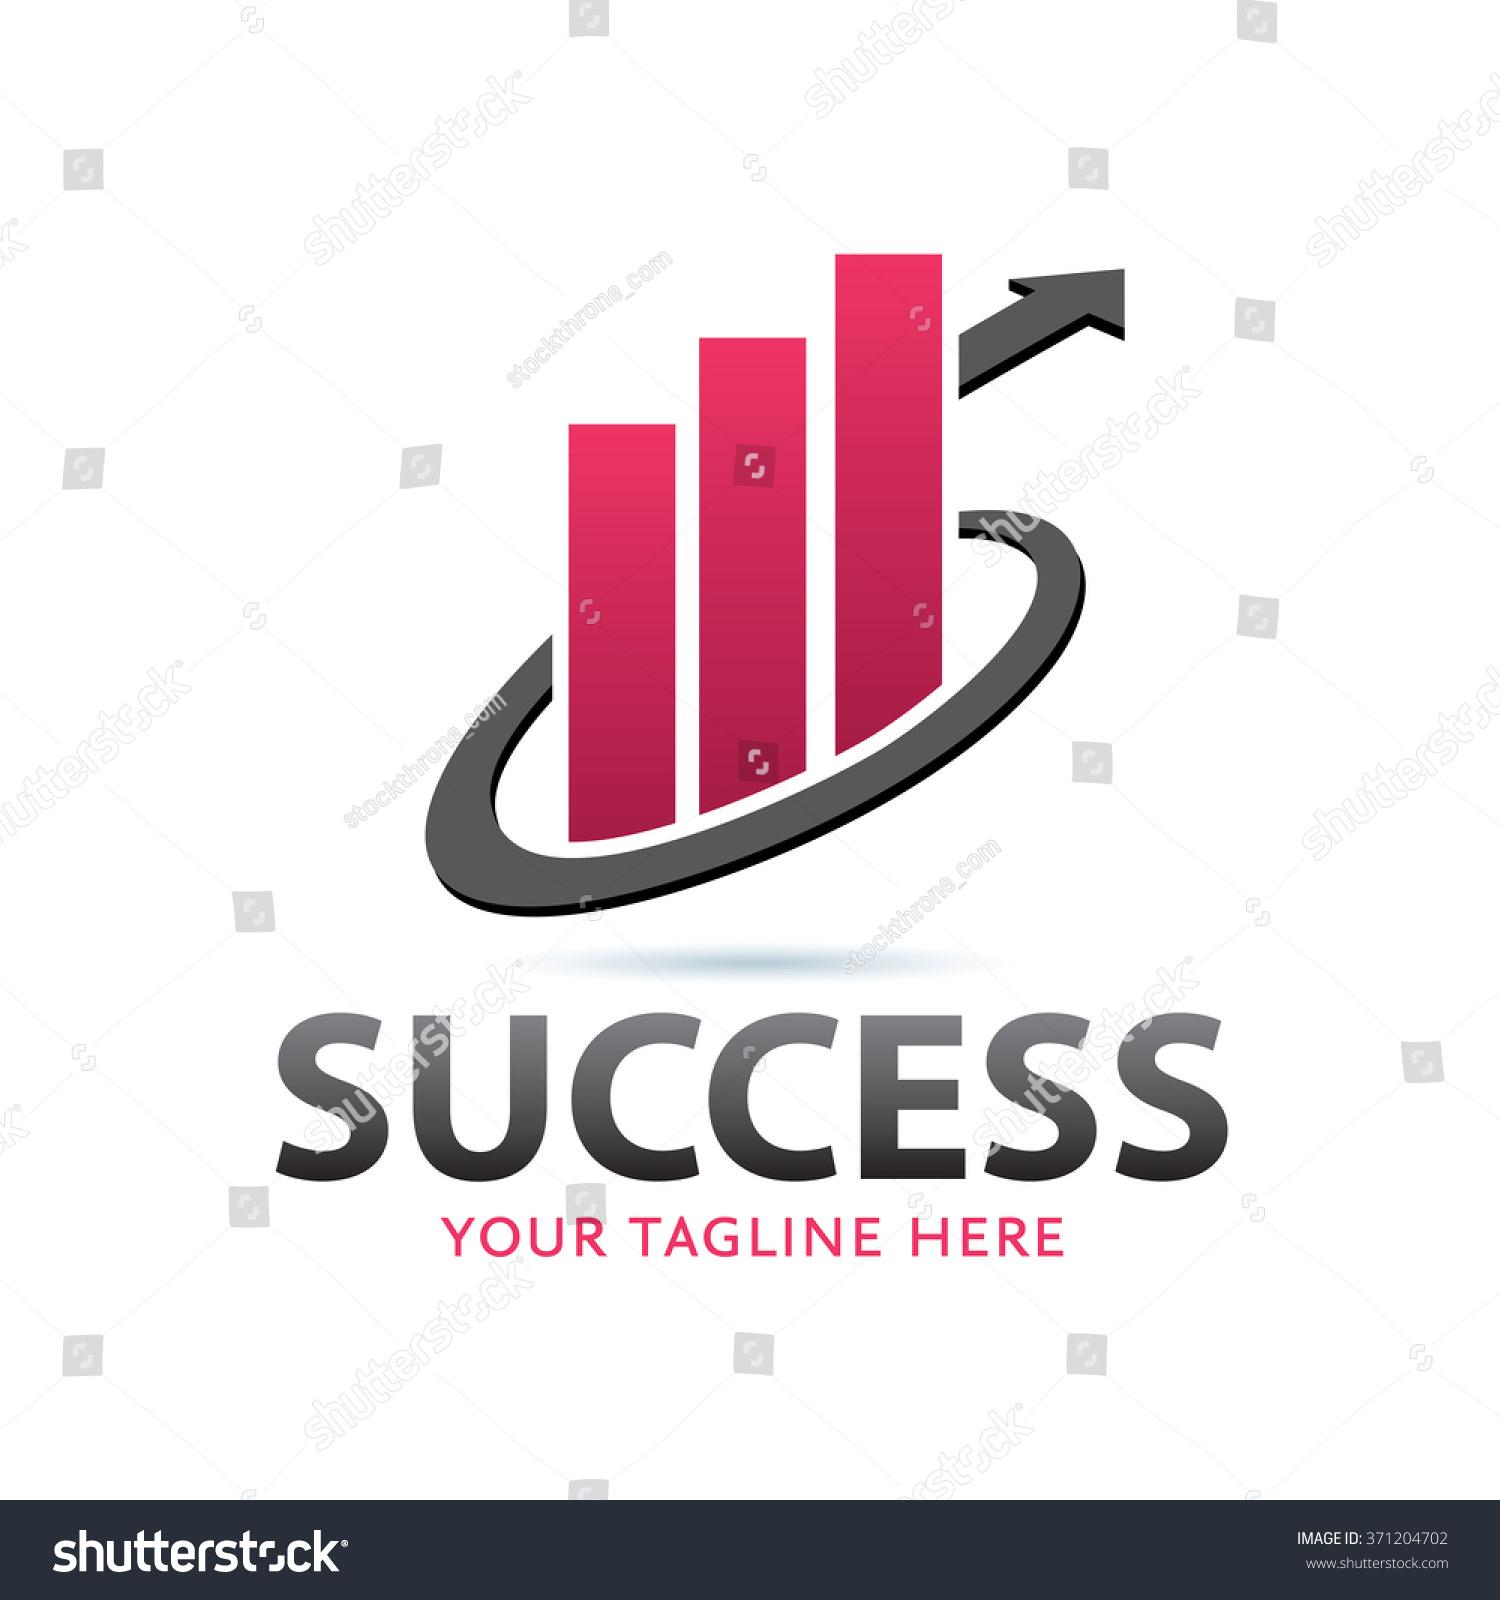 Online Image u0026 Photo Editor - Shutterstock Editor : photo editor logo : Top Logo Design